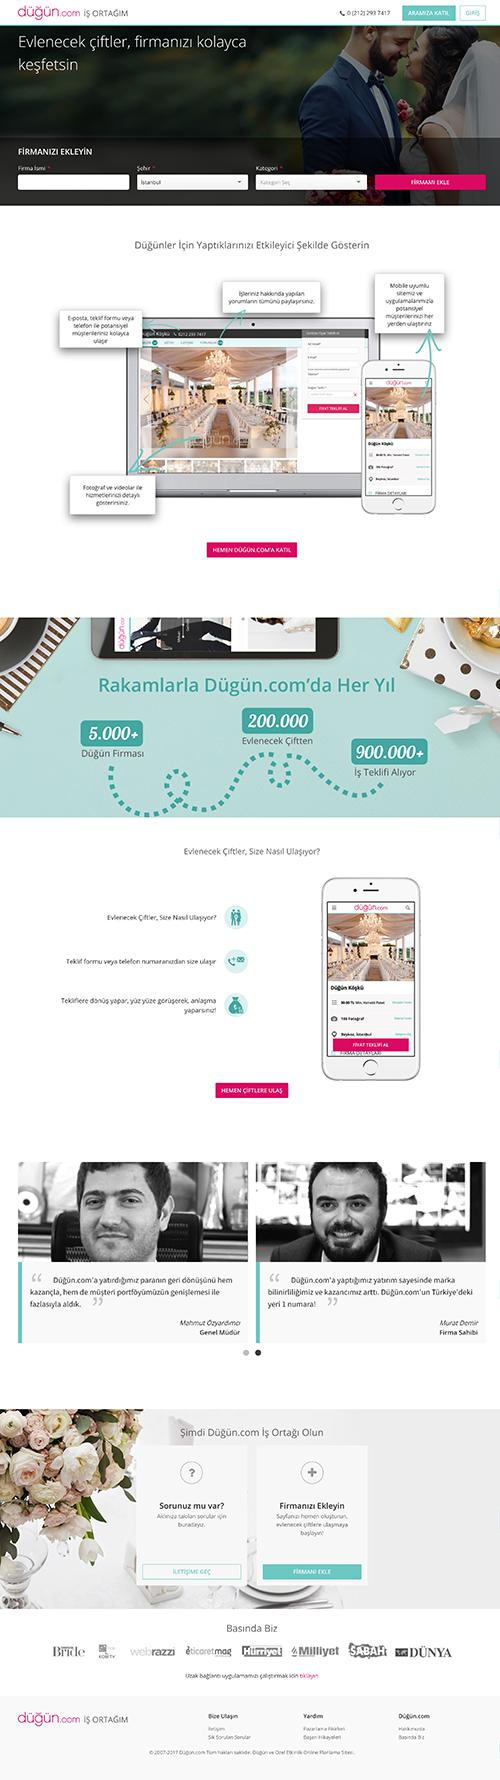 Dugun.com B2B Landing Page